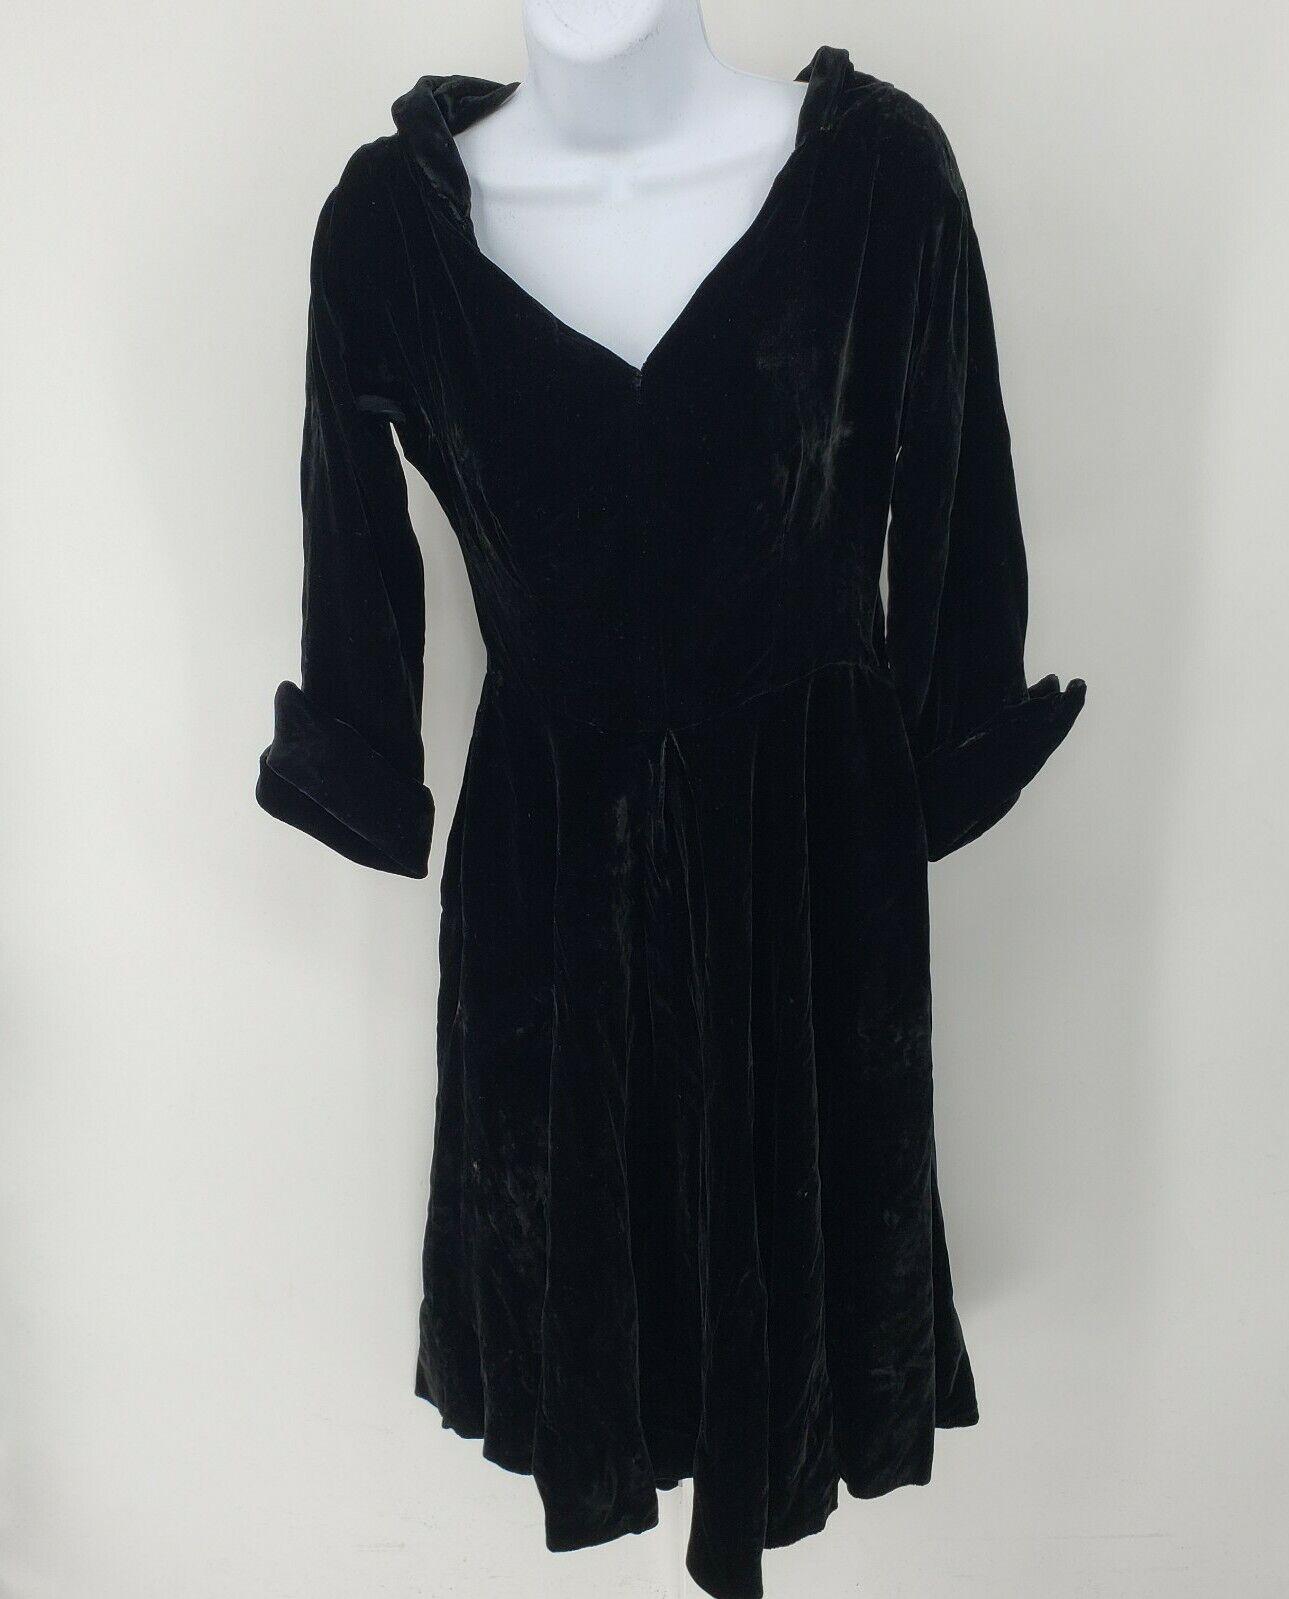 Ceil Chapman Collared Black Velvet Gown  Peplum T… - image 1